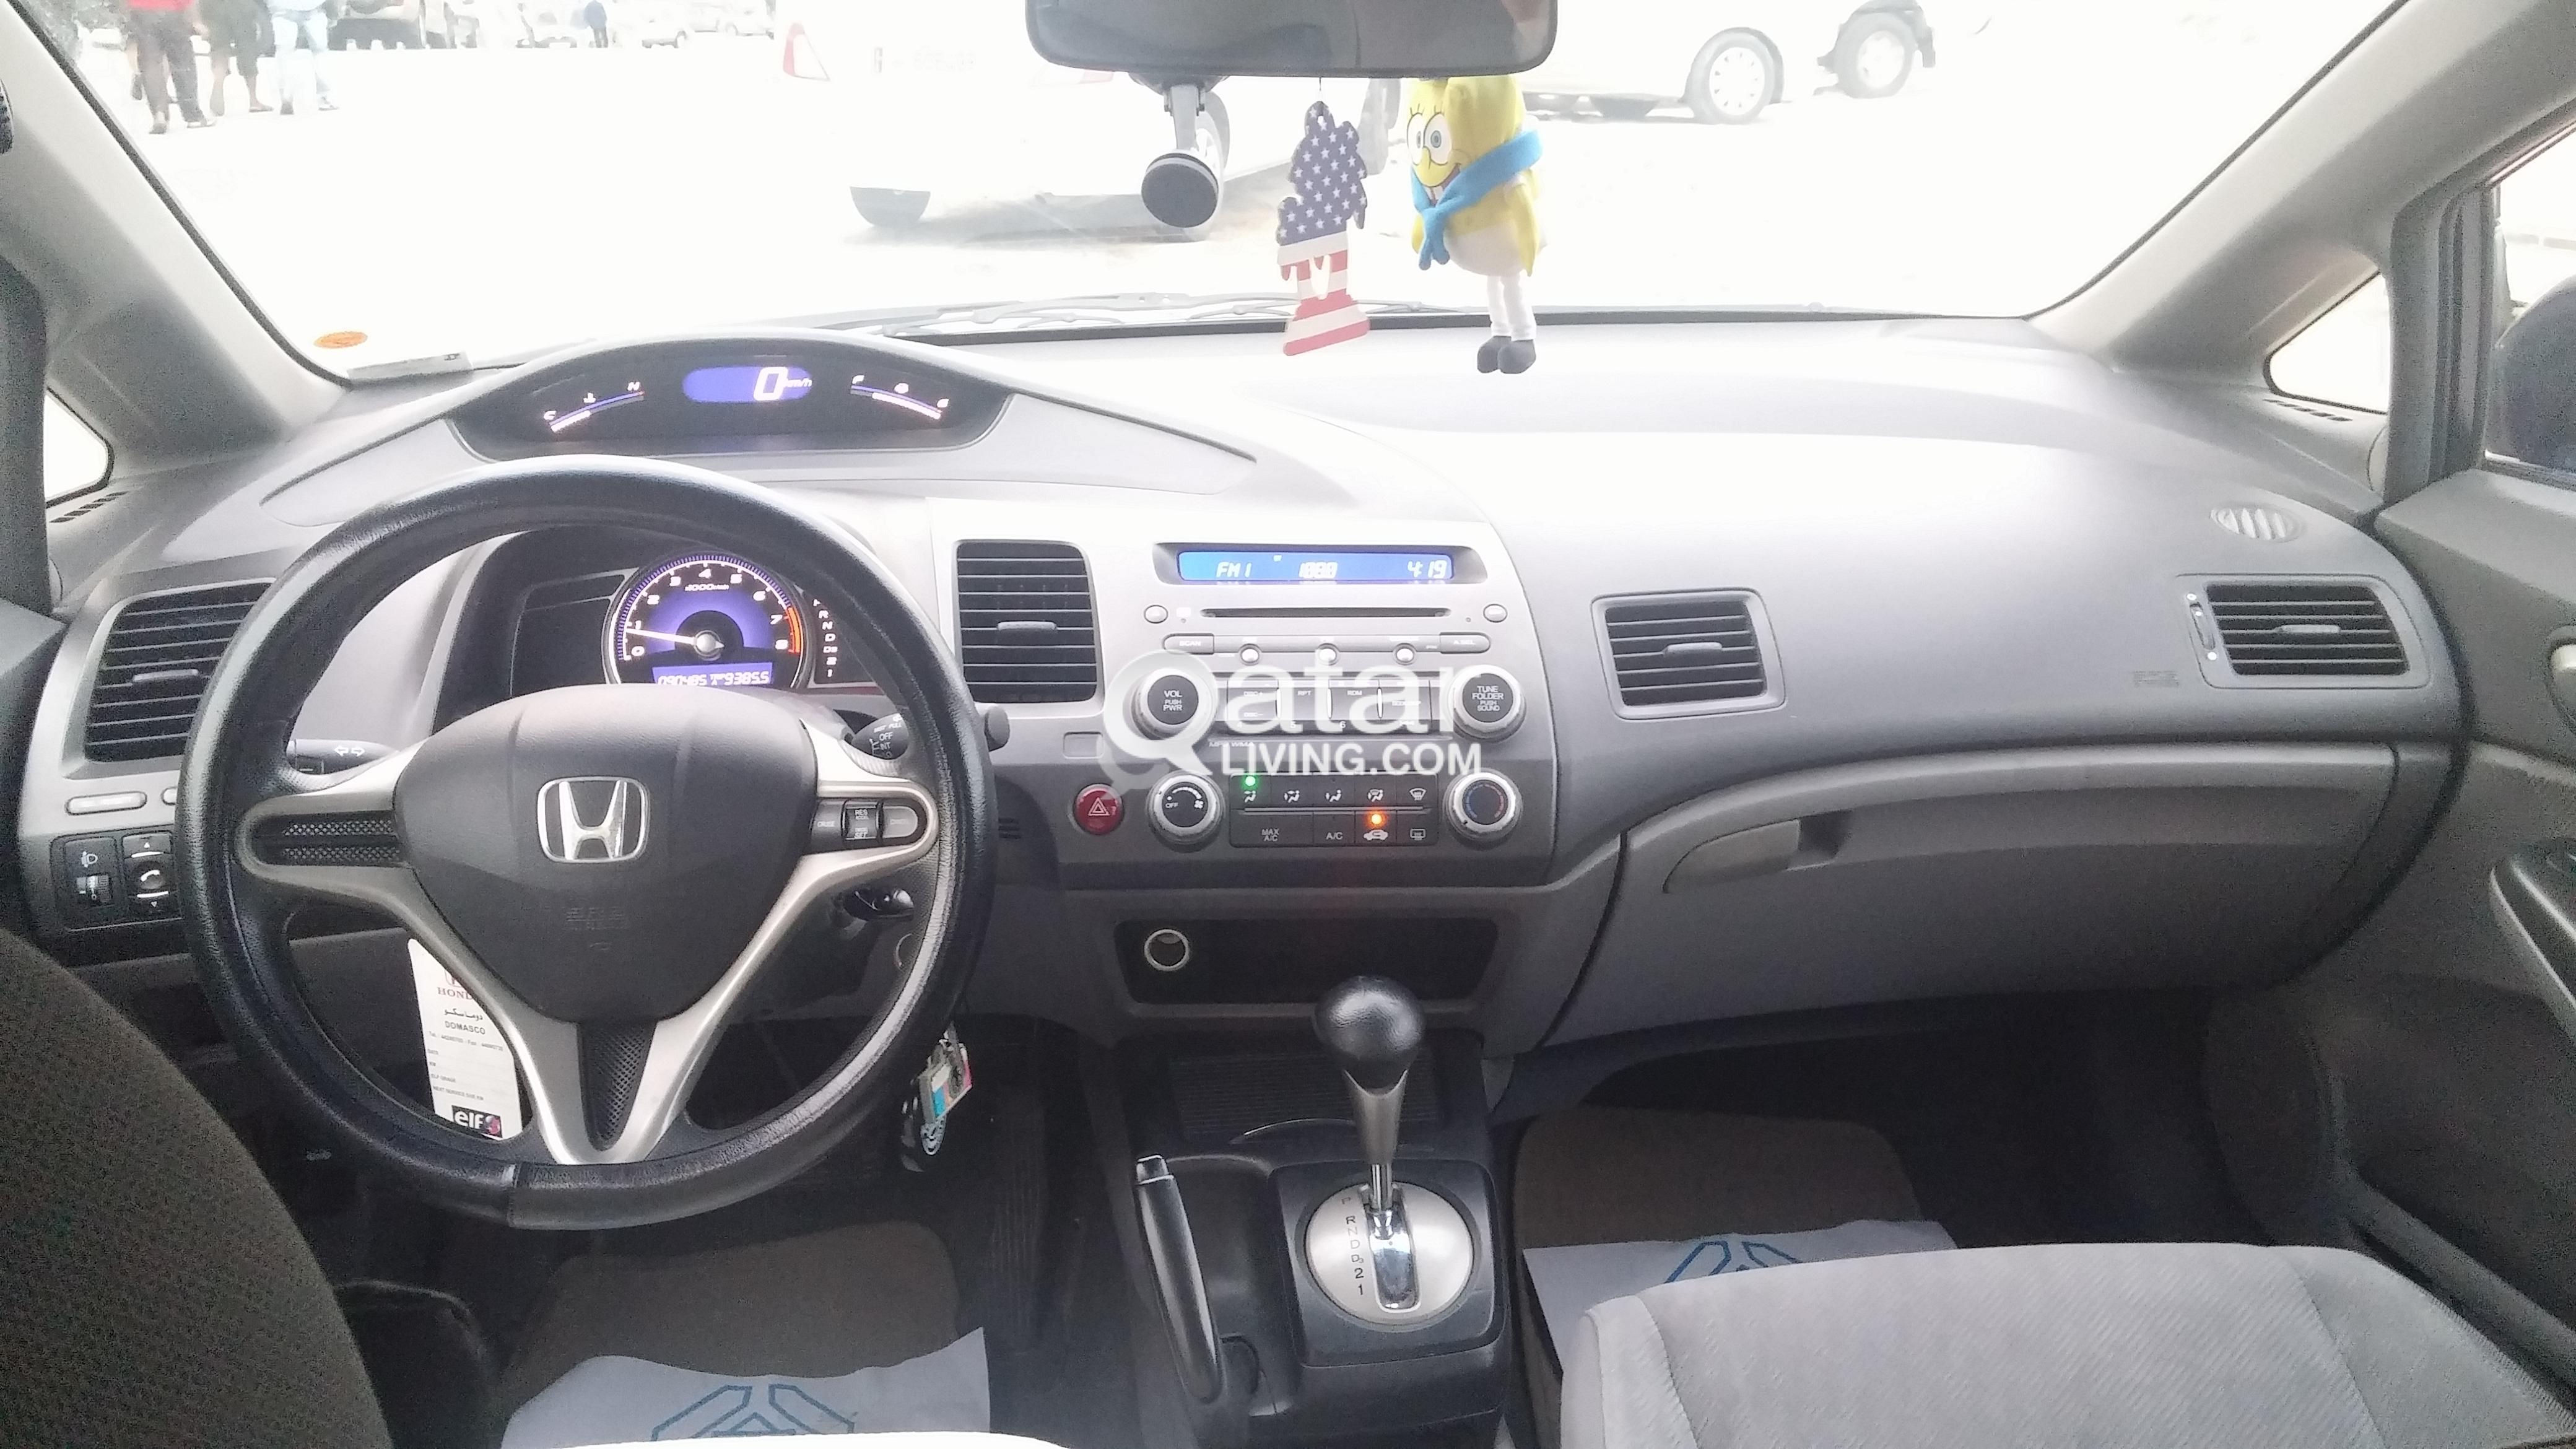 Honda Civic 2009 For Sale Qatar Living